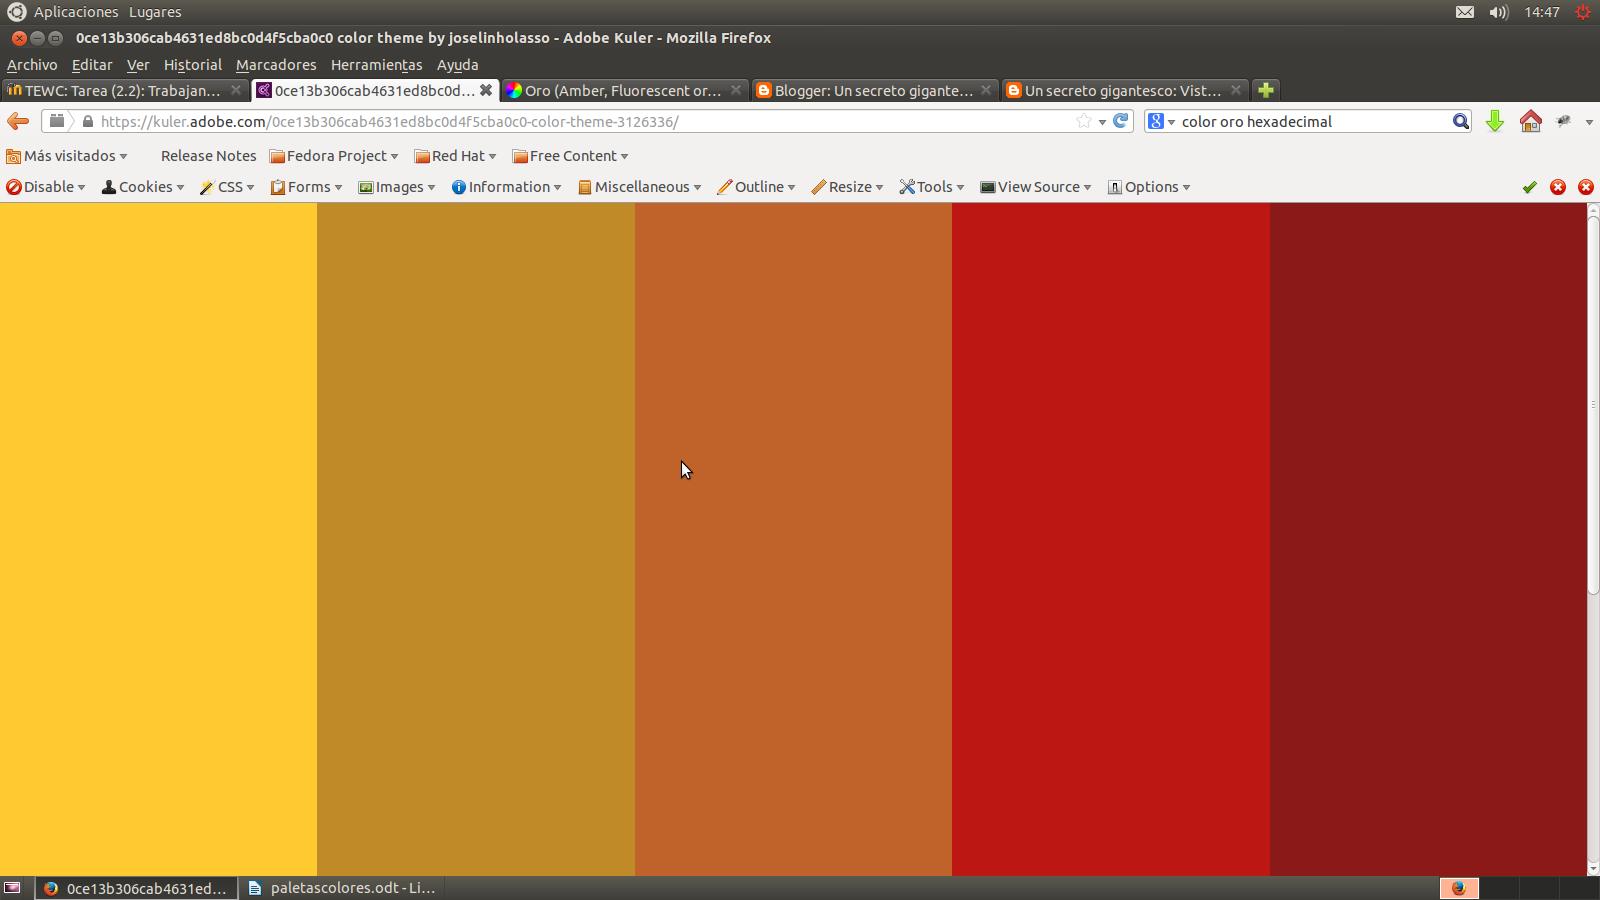 Un secreto gigantesco proyecto tewc paletas de colores ii - Gama de colores calidos ...